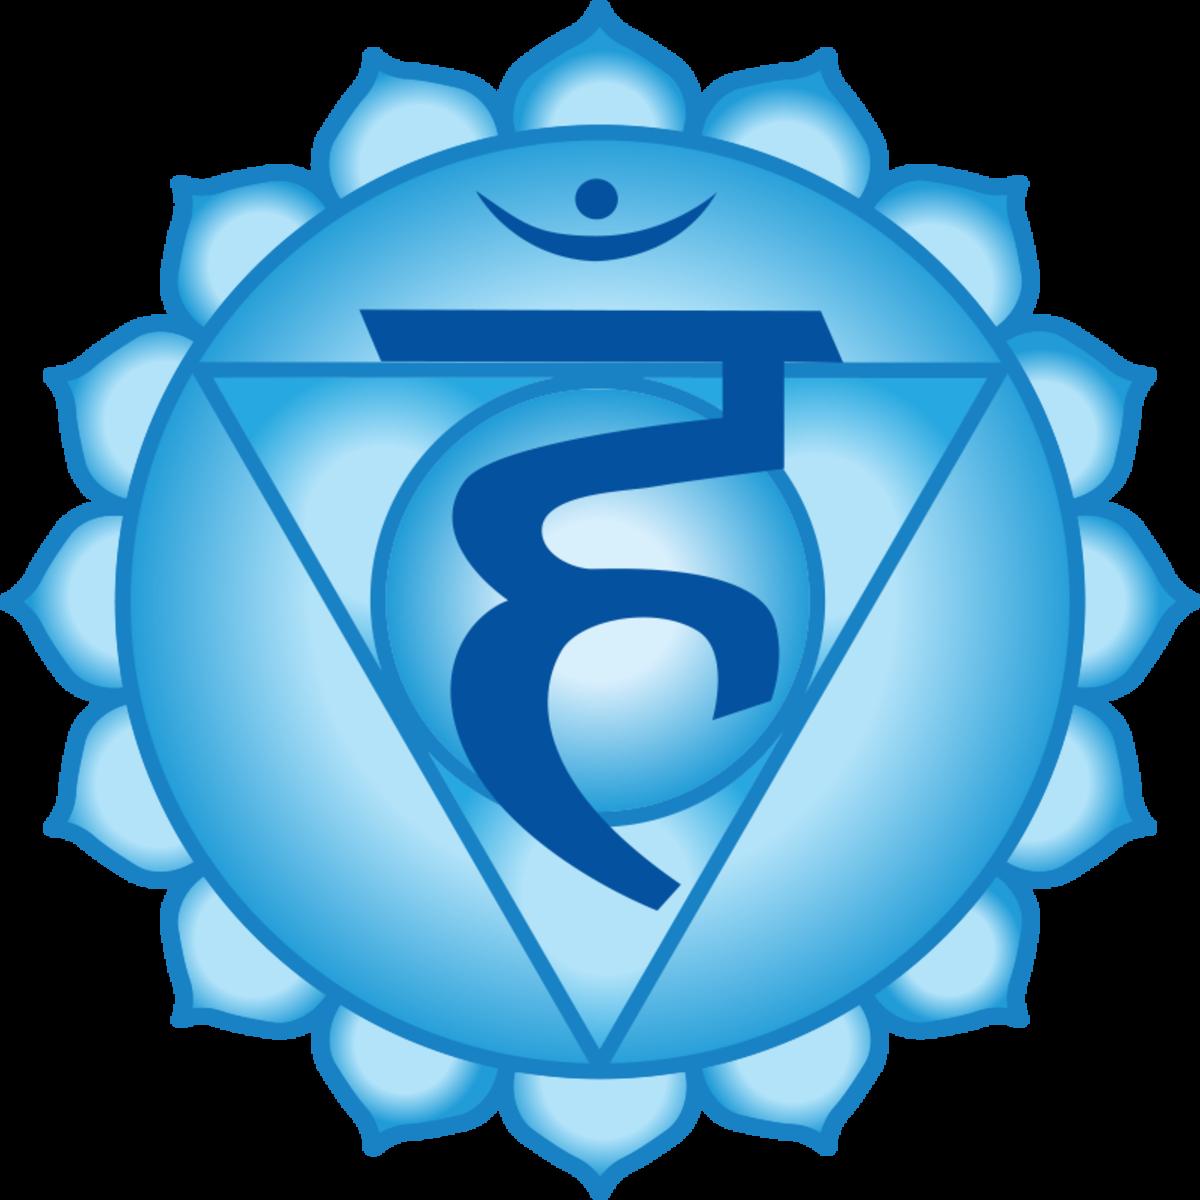 Vishuddhi chakra (Throat chakra)